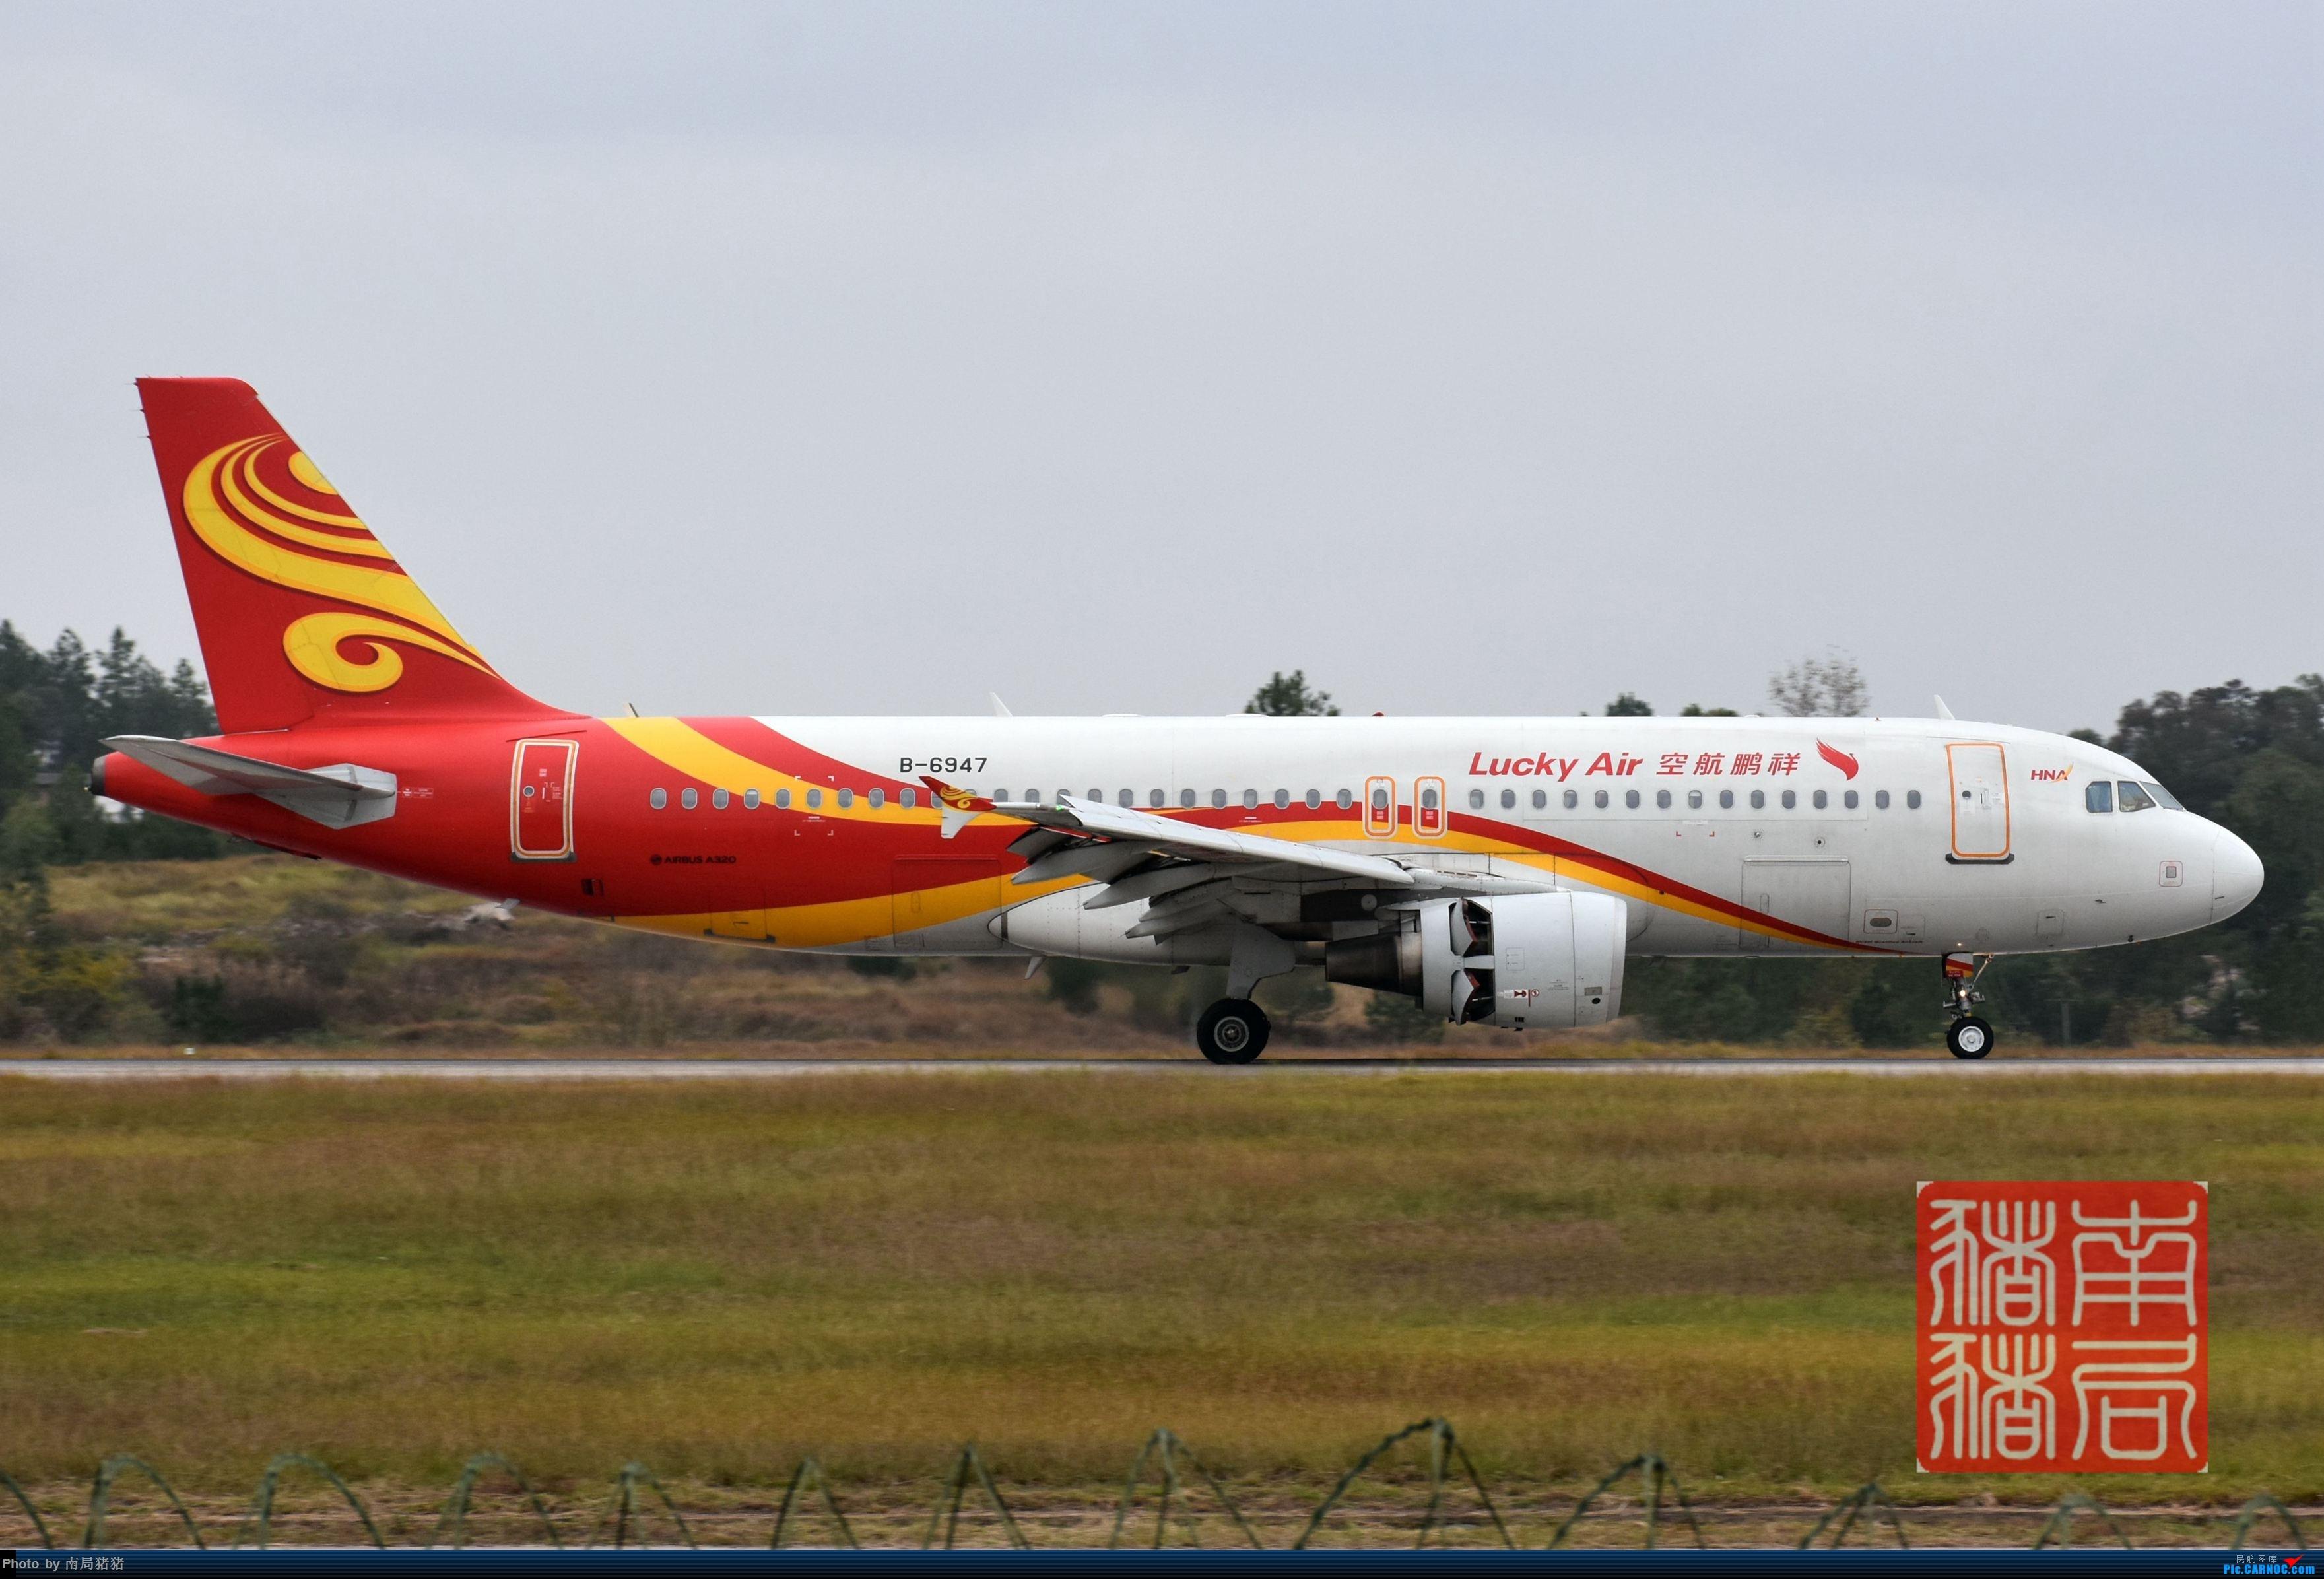 Re:[原创]KOW赣州黄金机场(通航运12,北部湾变形金刚) AIRBUS A320-200 B-6947 中国赣州黄金机场